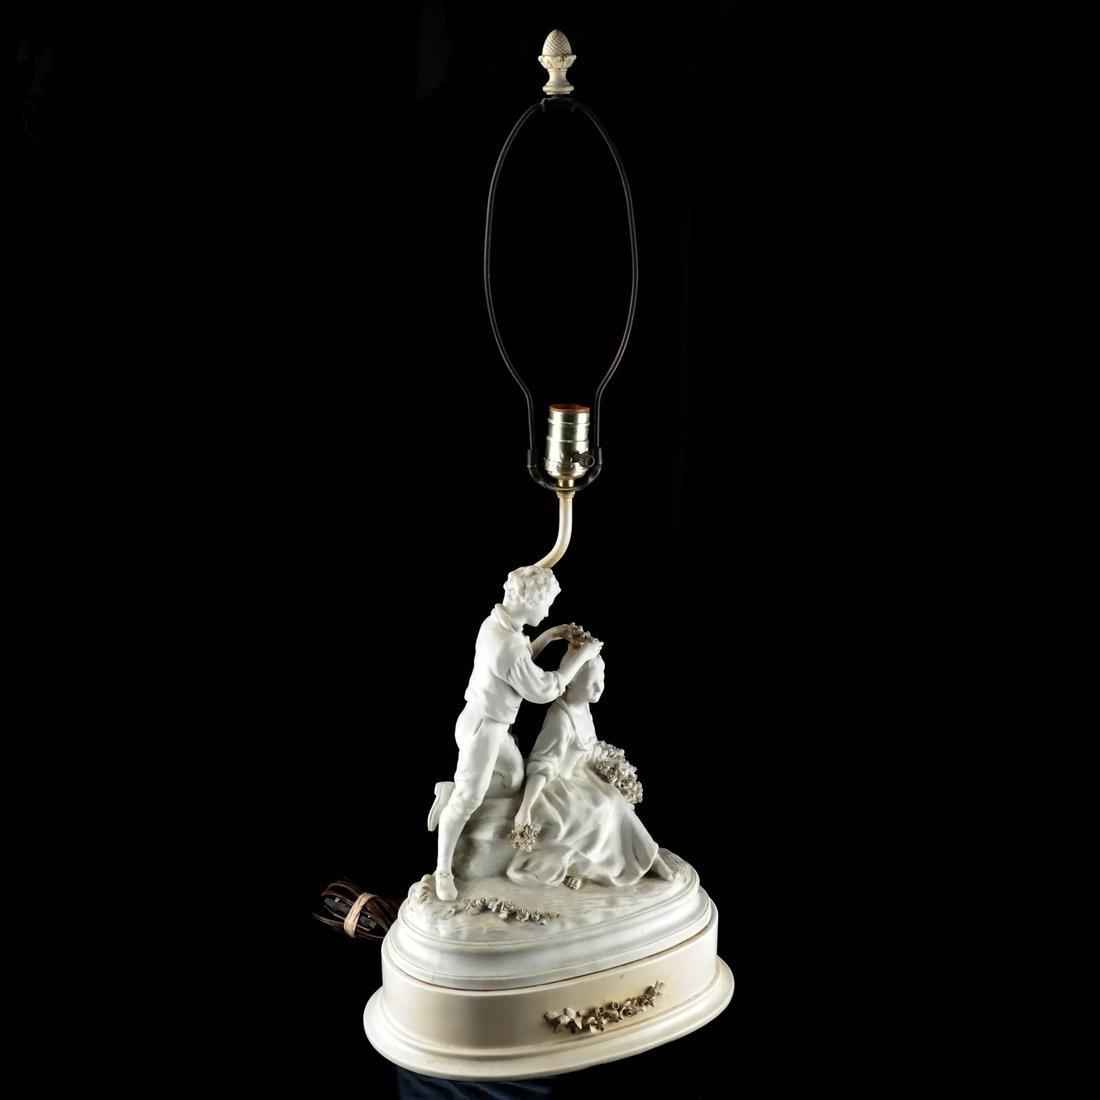 Bisque Porcelain Group Lamp - 2